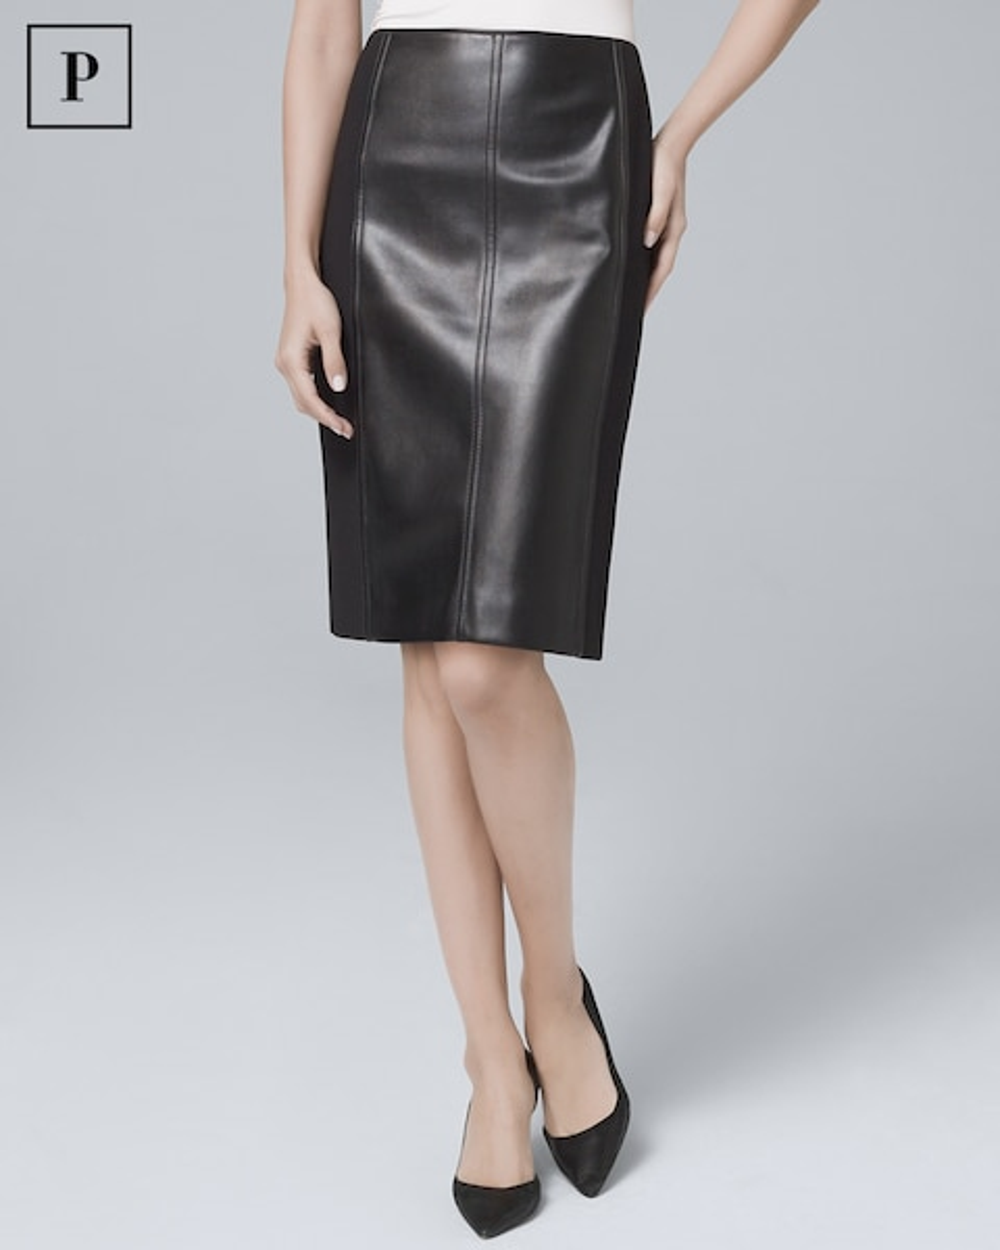 0d224179fd Petite Faux Leather & Ponte Knit Boot Skirt - White House Black Market